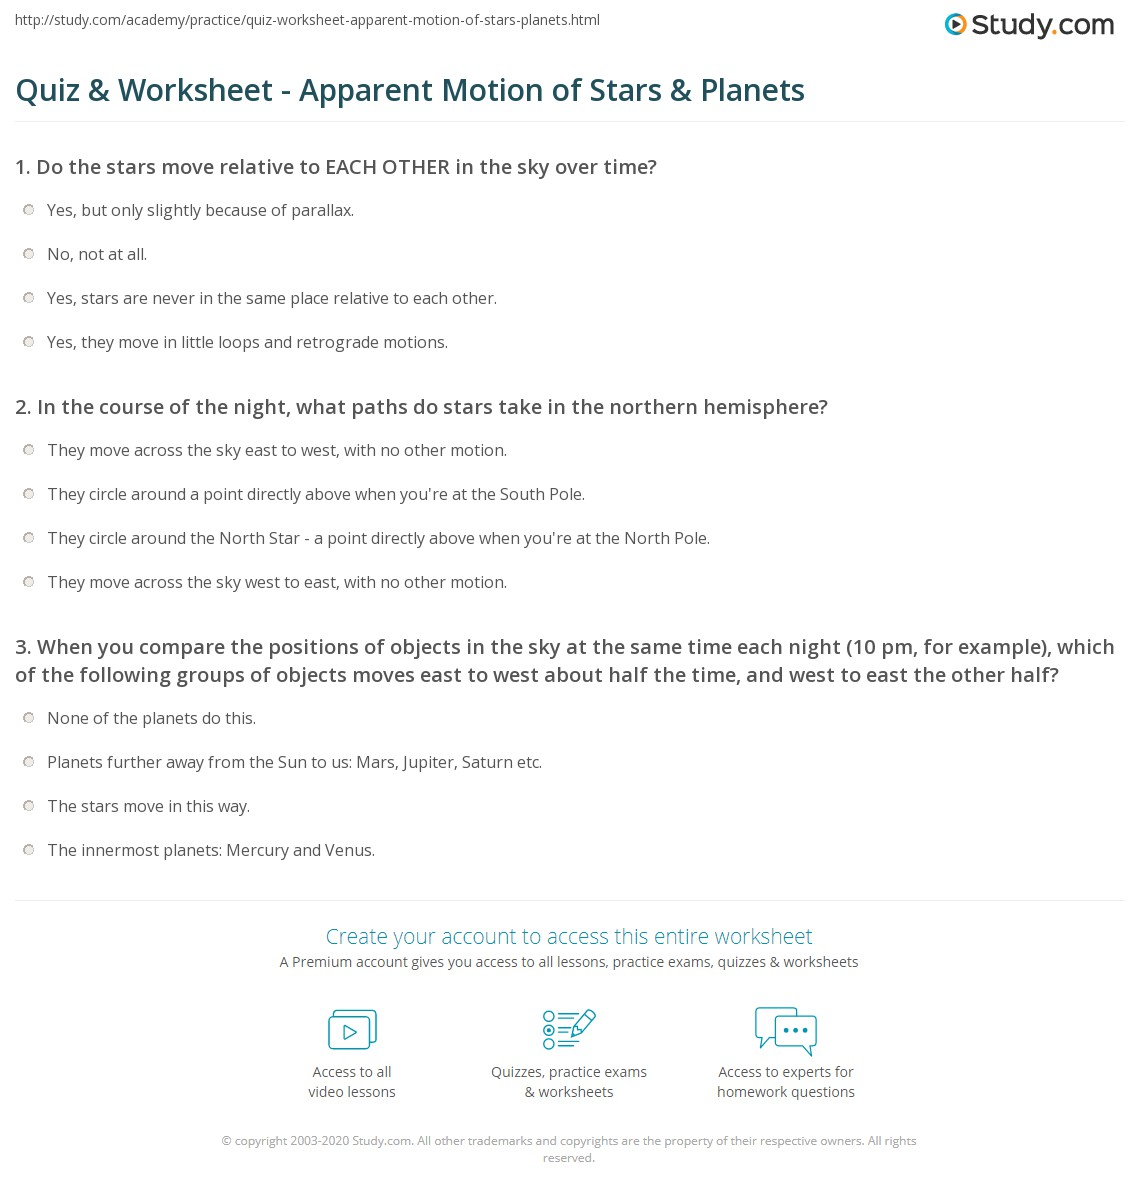 Printables Biology Worksheets With Answers free biology worksheets with answers intrepidpath in motion evolution lab worksheet for